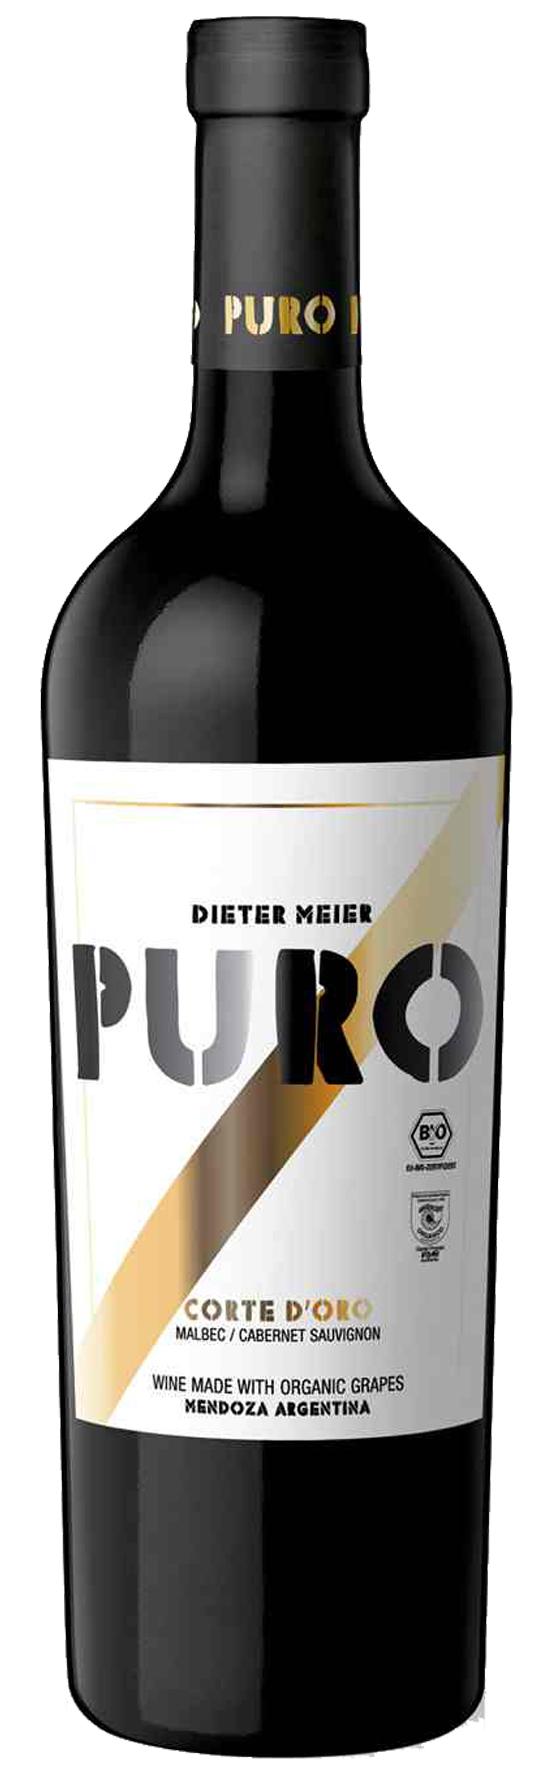 DIETER MEIER Puro Corte D'Oro 2014